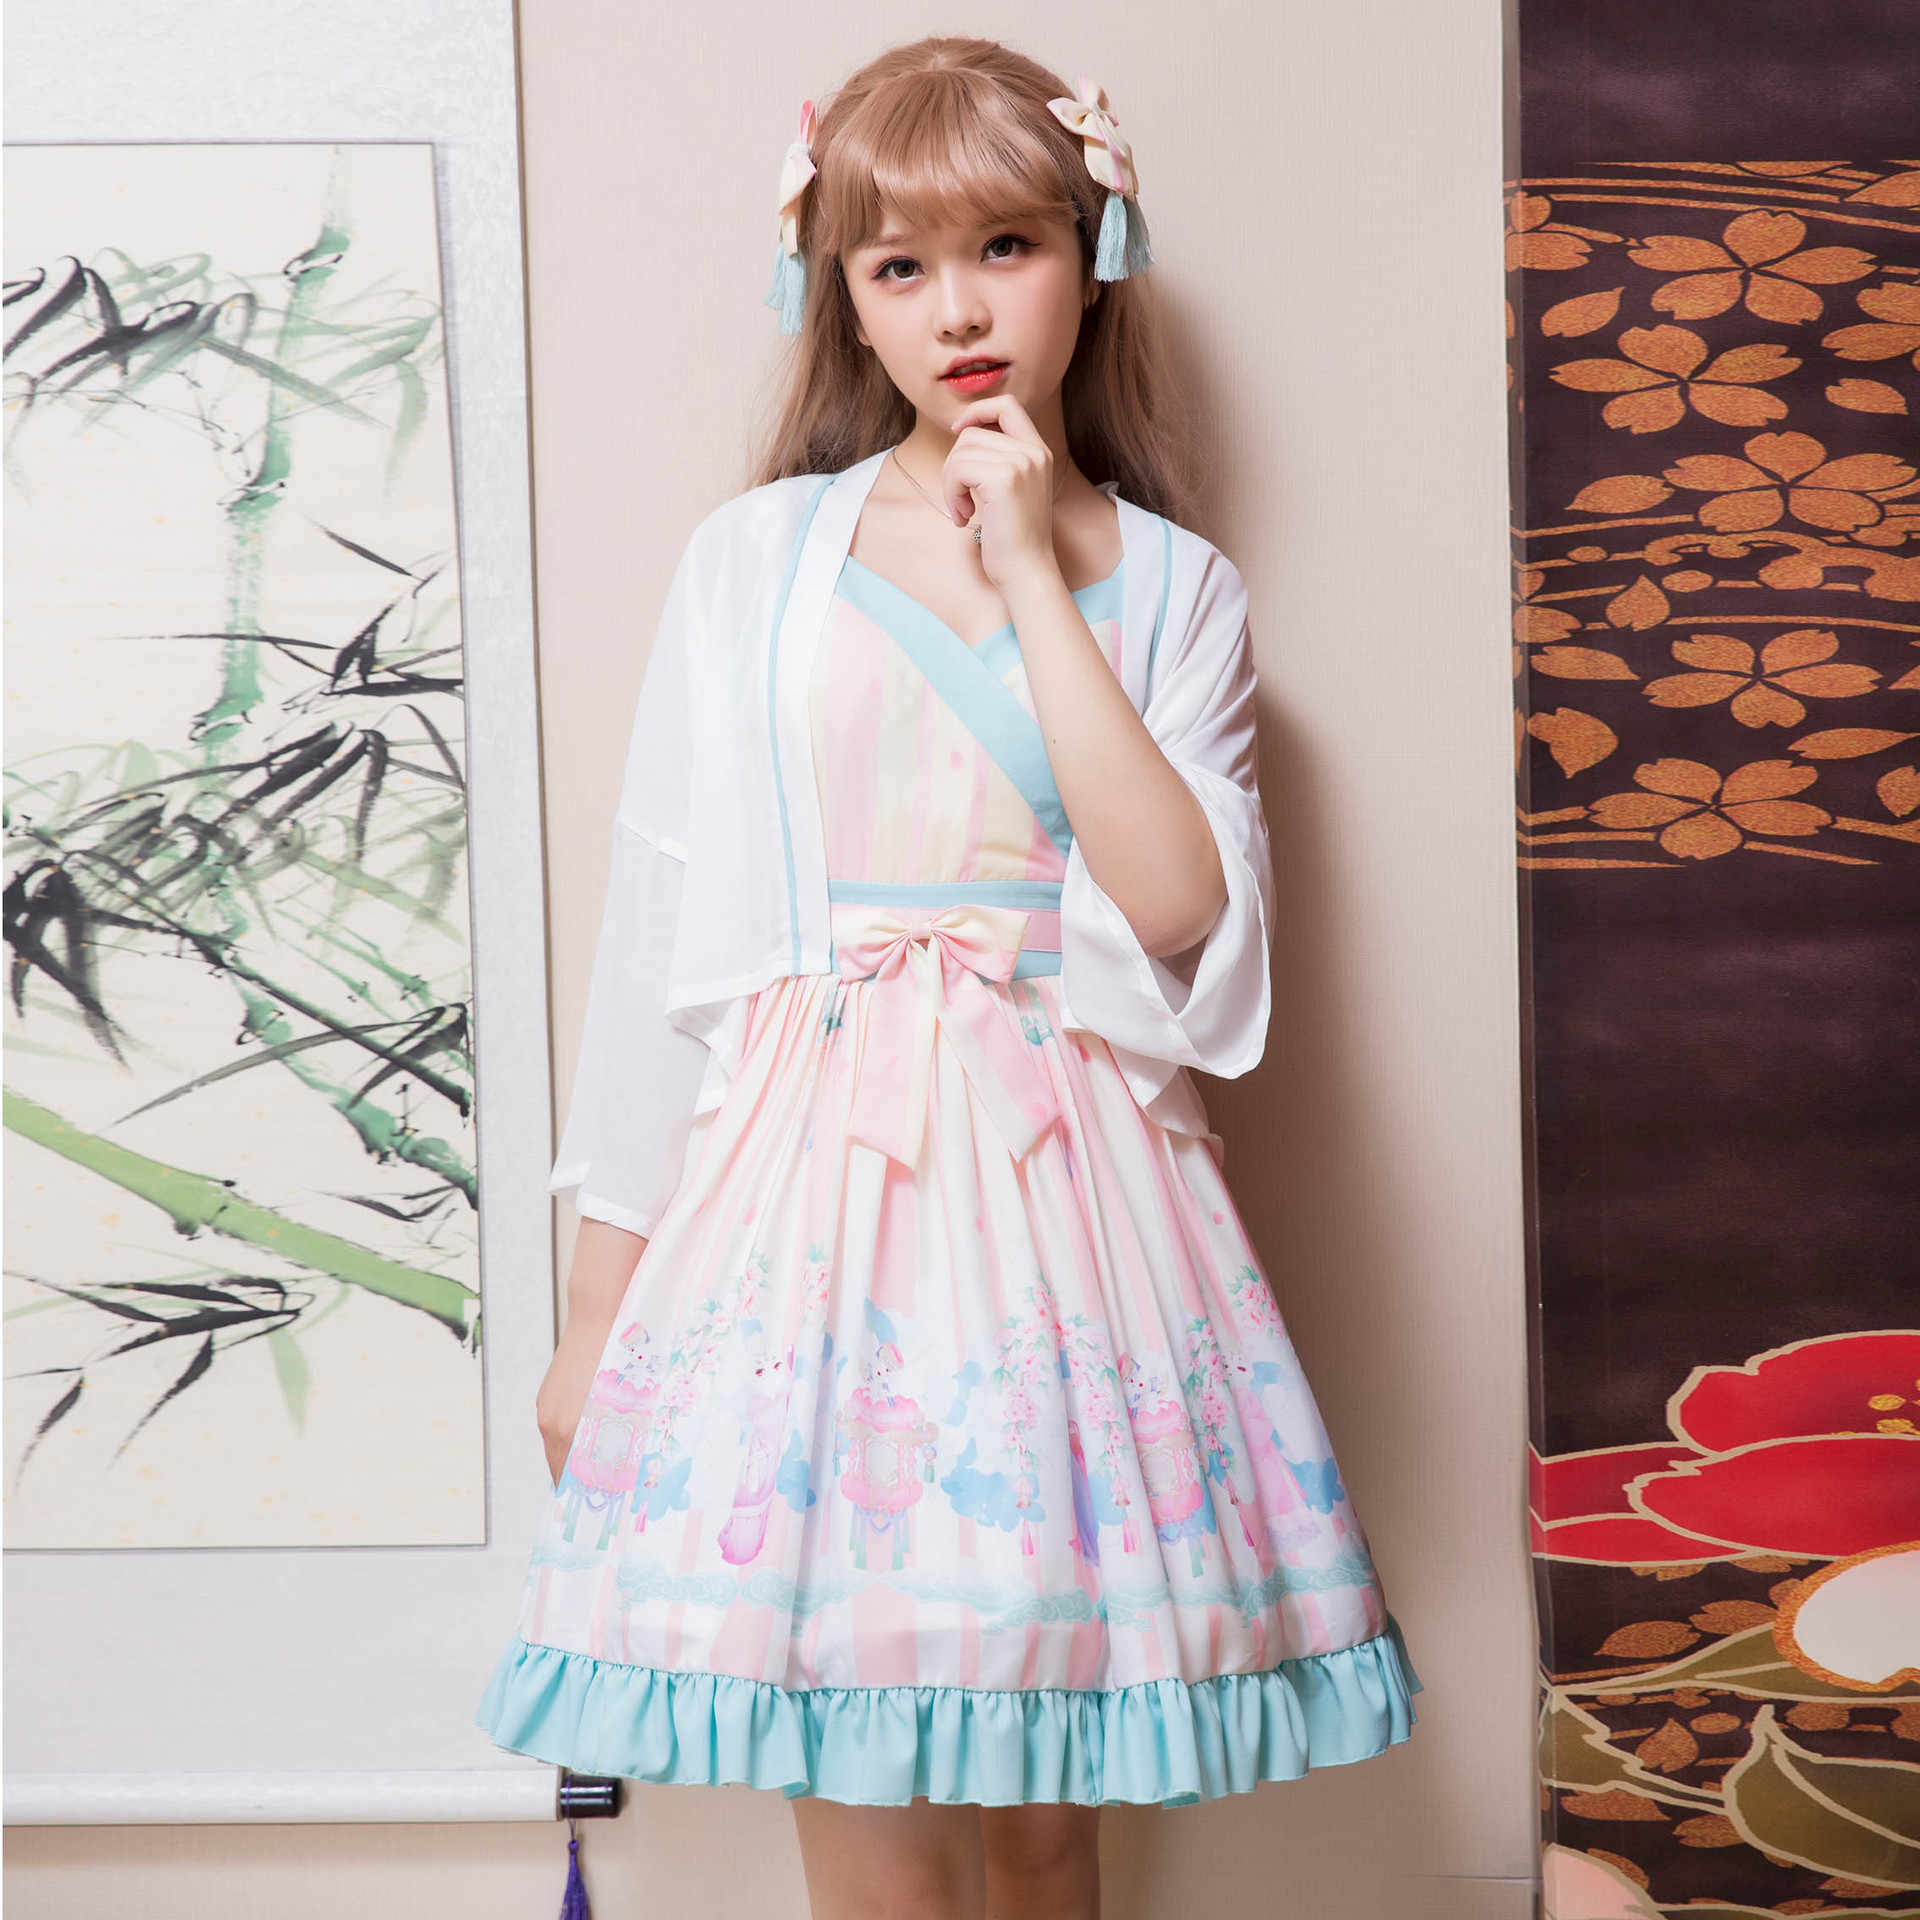 48a87b6be ... Women's Ancient Chinese Qi Lolita Dress Han Dynasty Printed Hanfu  Dresses ...